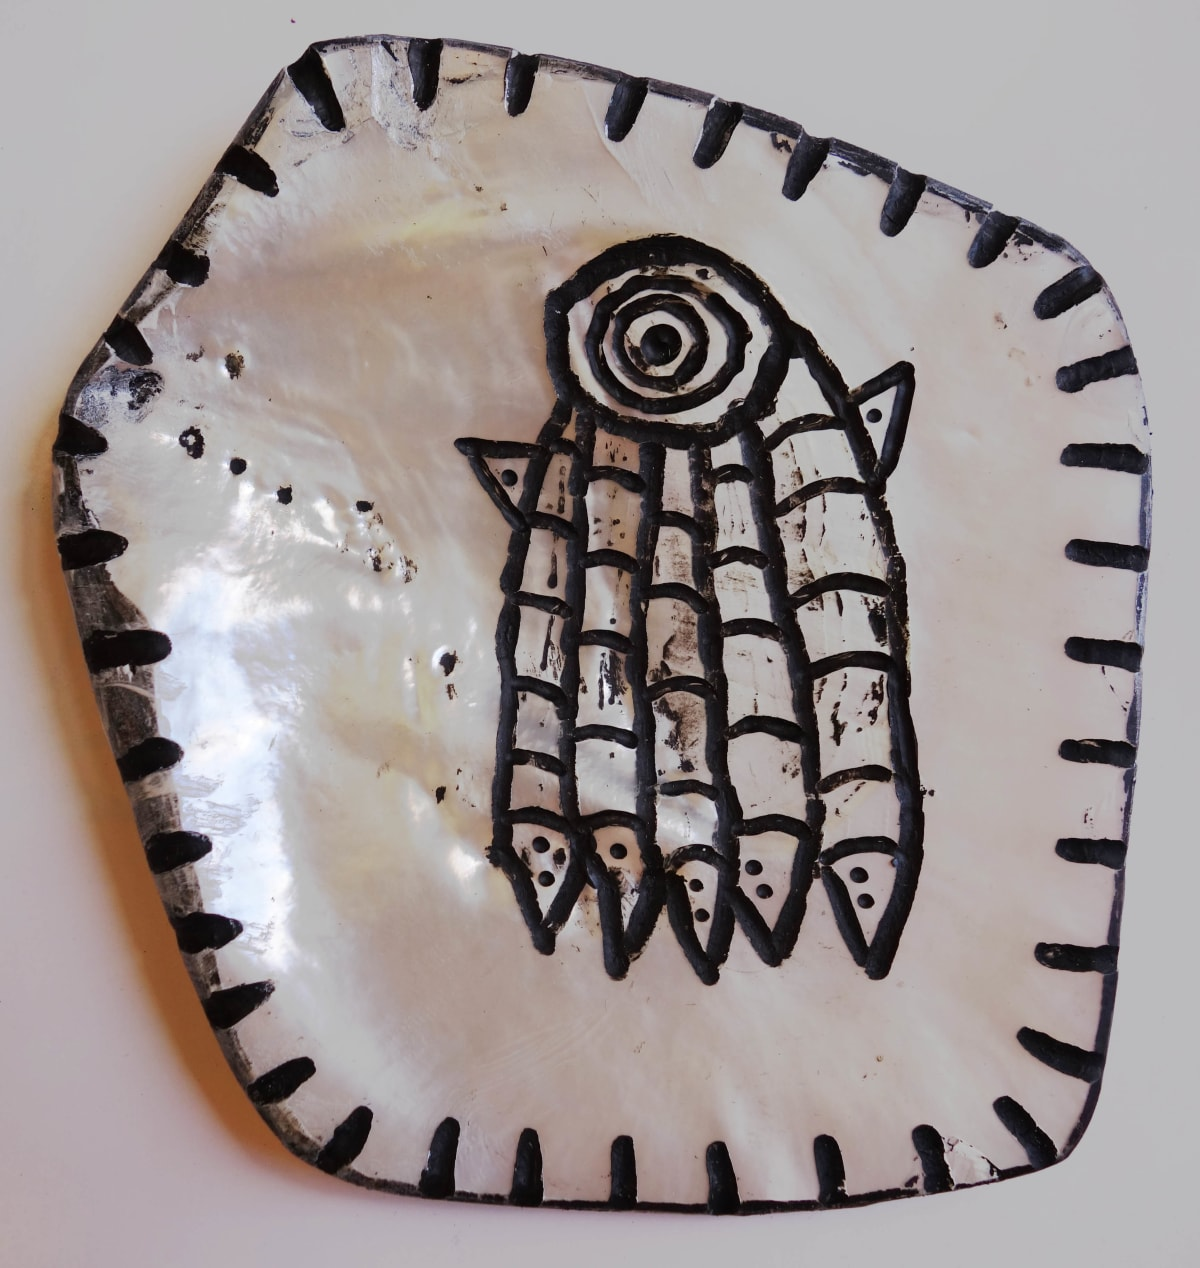 Stephen Eastaugh SHELL-12, 2015 Pearl shell and acrylic